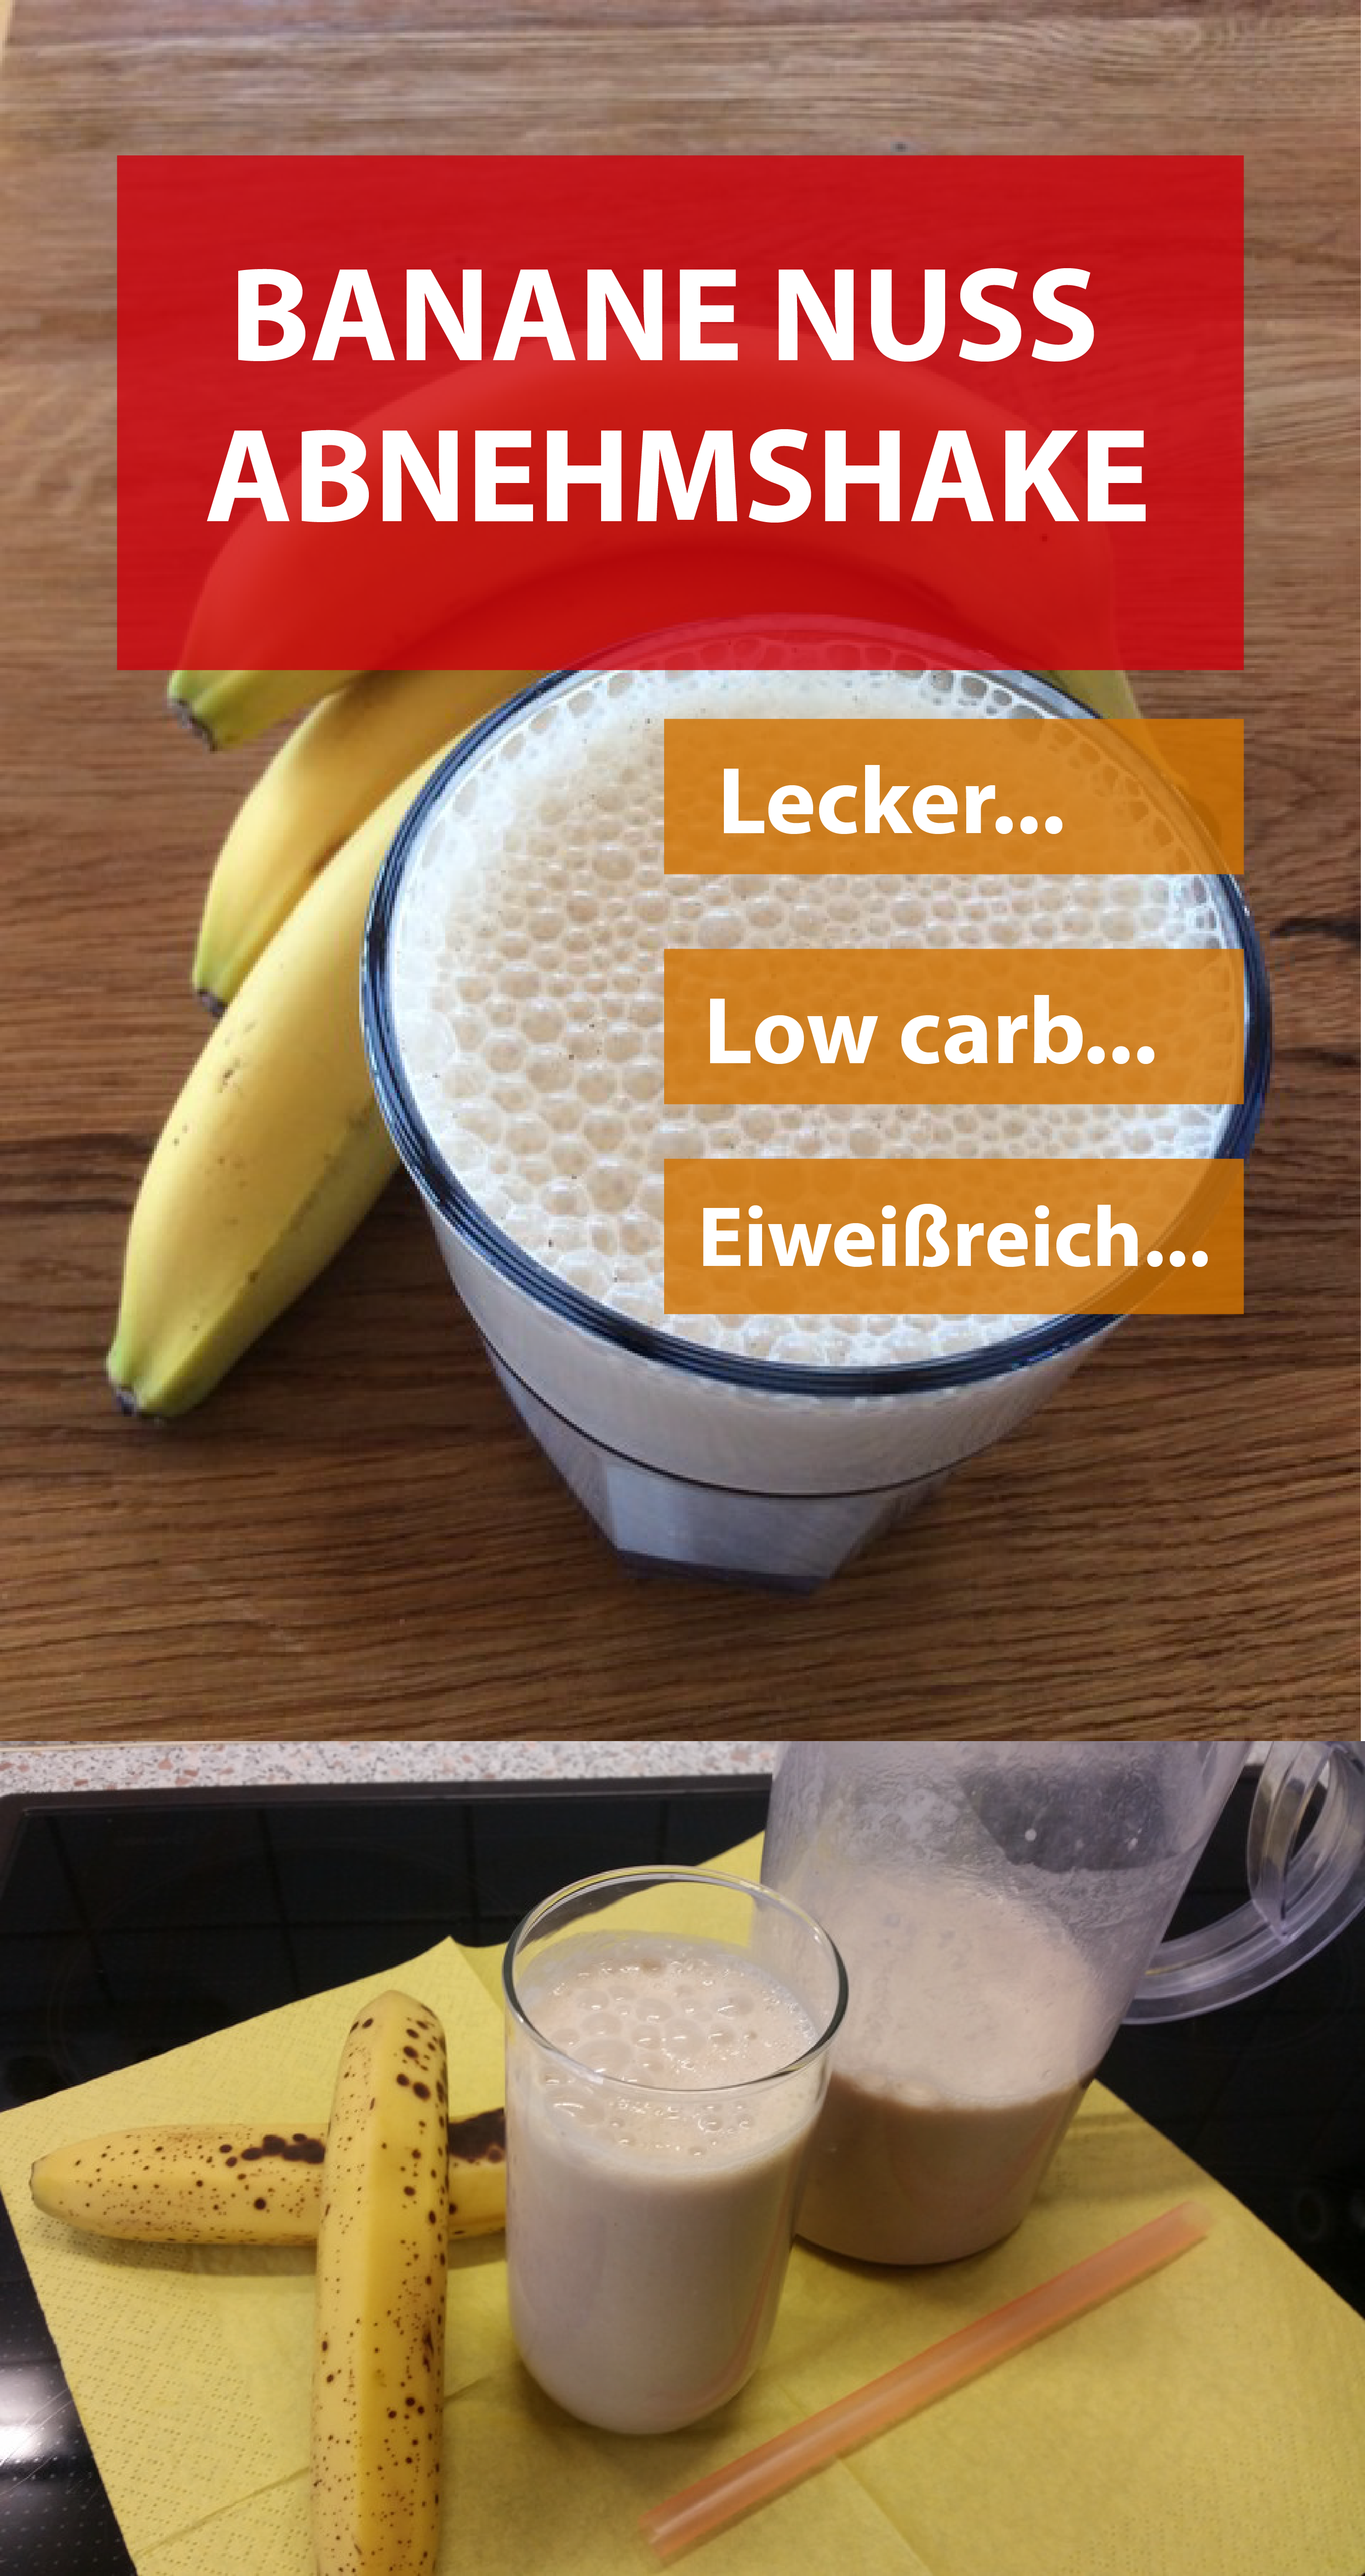 BANANE NUSS ABNEHMSHAKE - Selbstgemachter Banane Nuss Eiweißshake